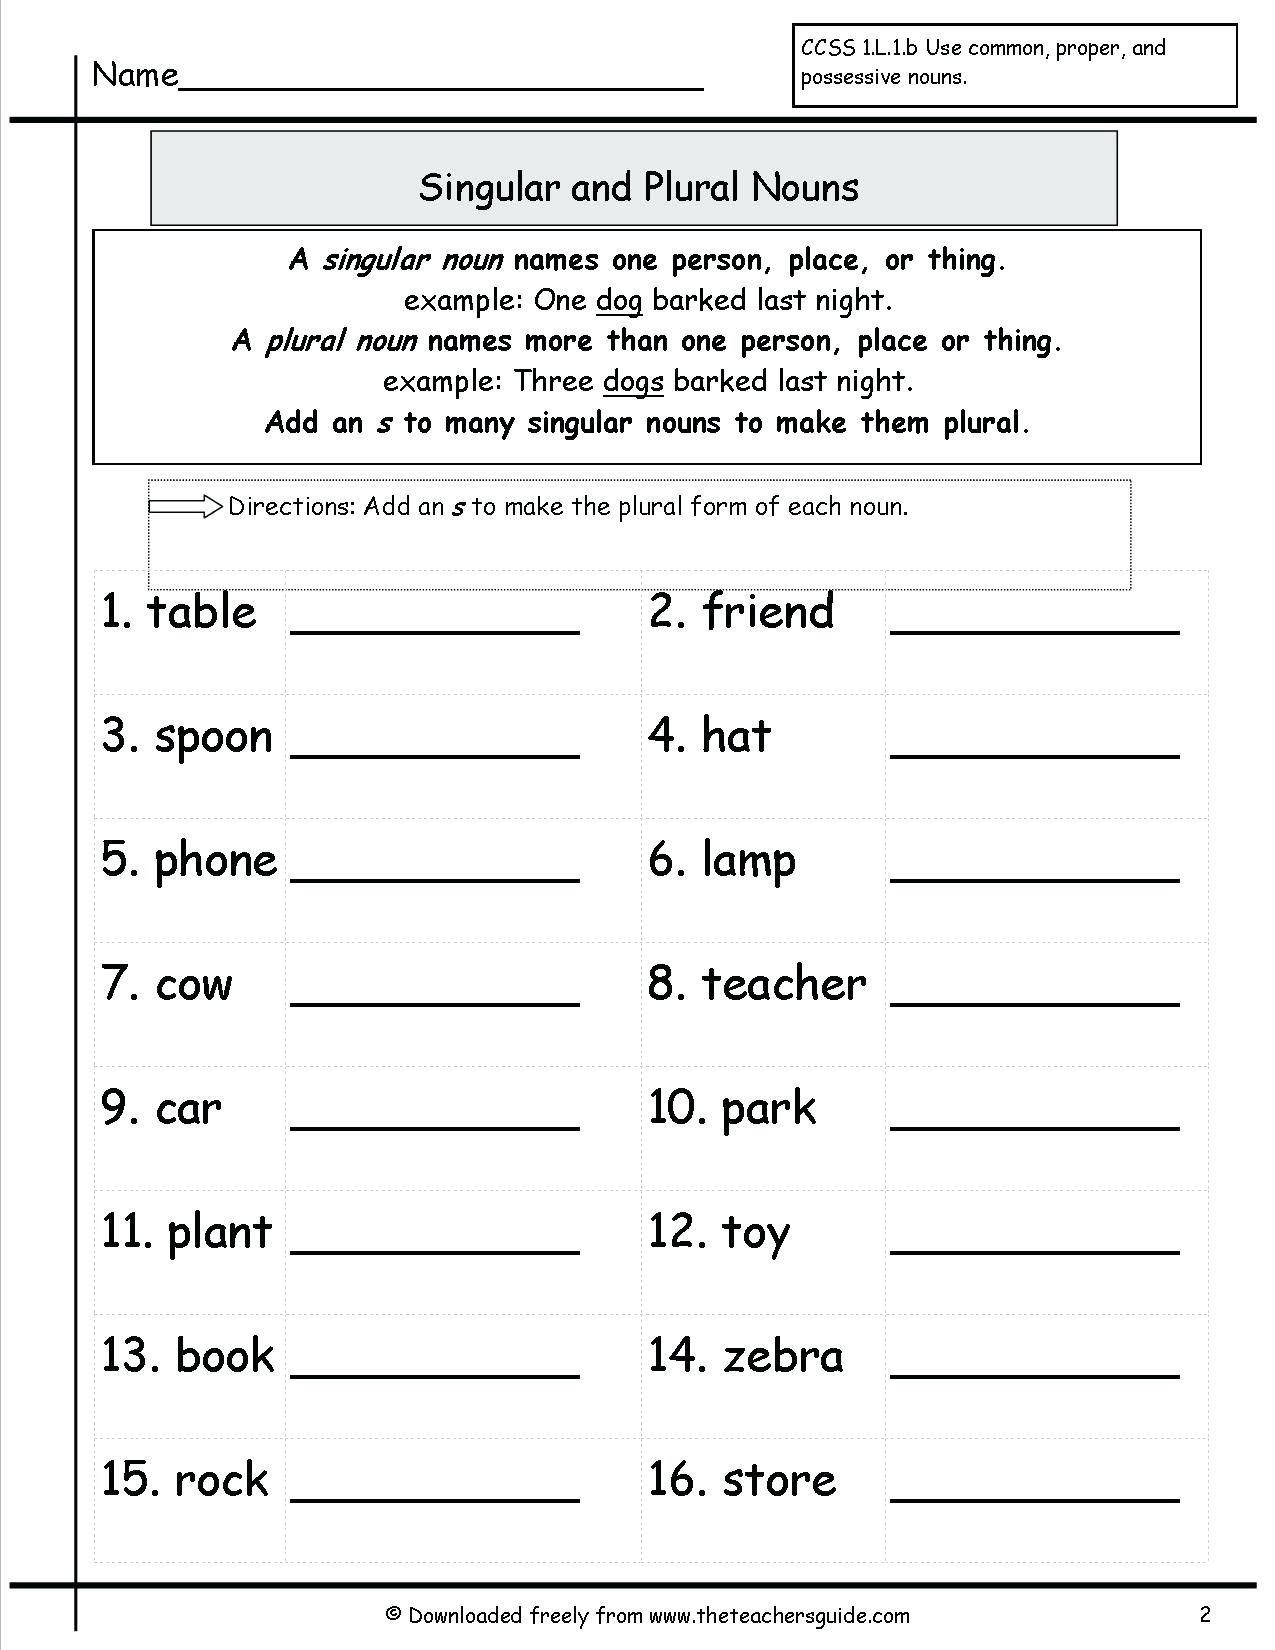 Noun Worksheets 2nd Grade In 2020 Nouns Worksheet Plurals Worksheets Plural Nouns Worksheet